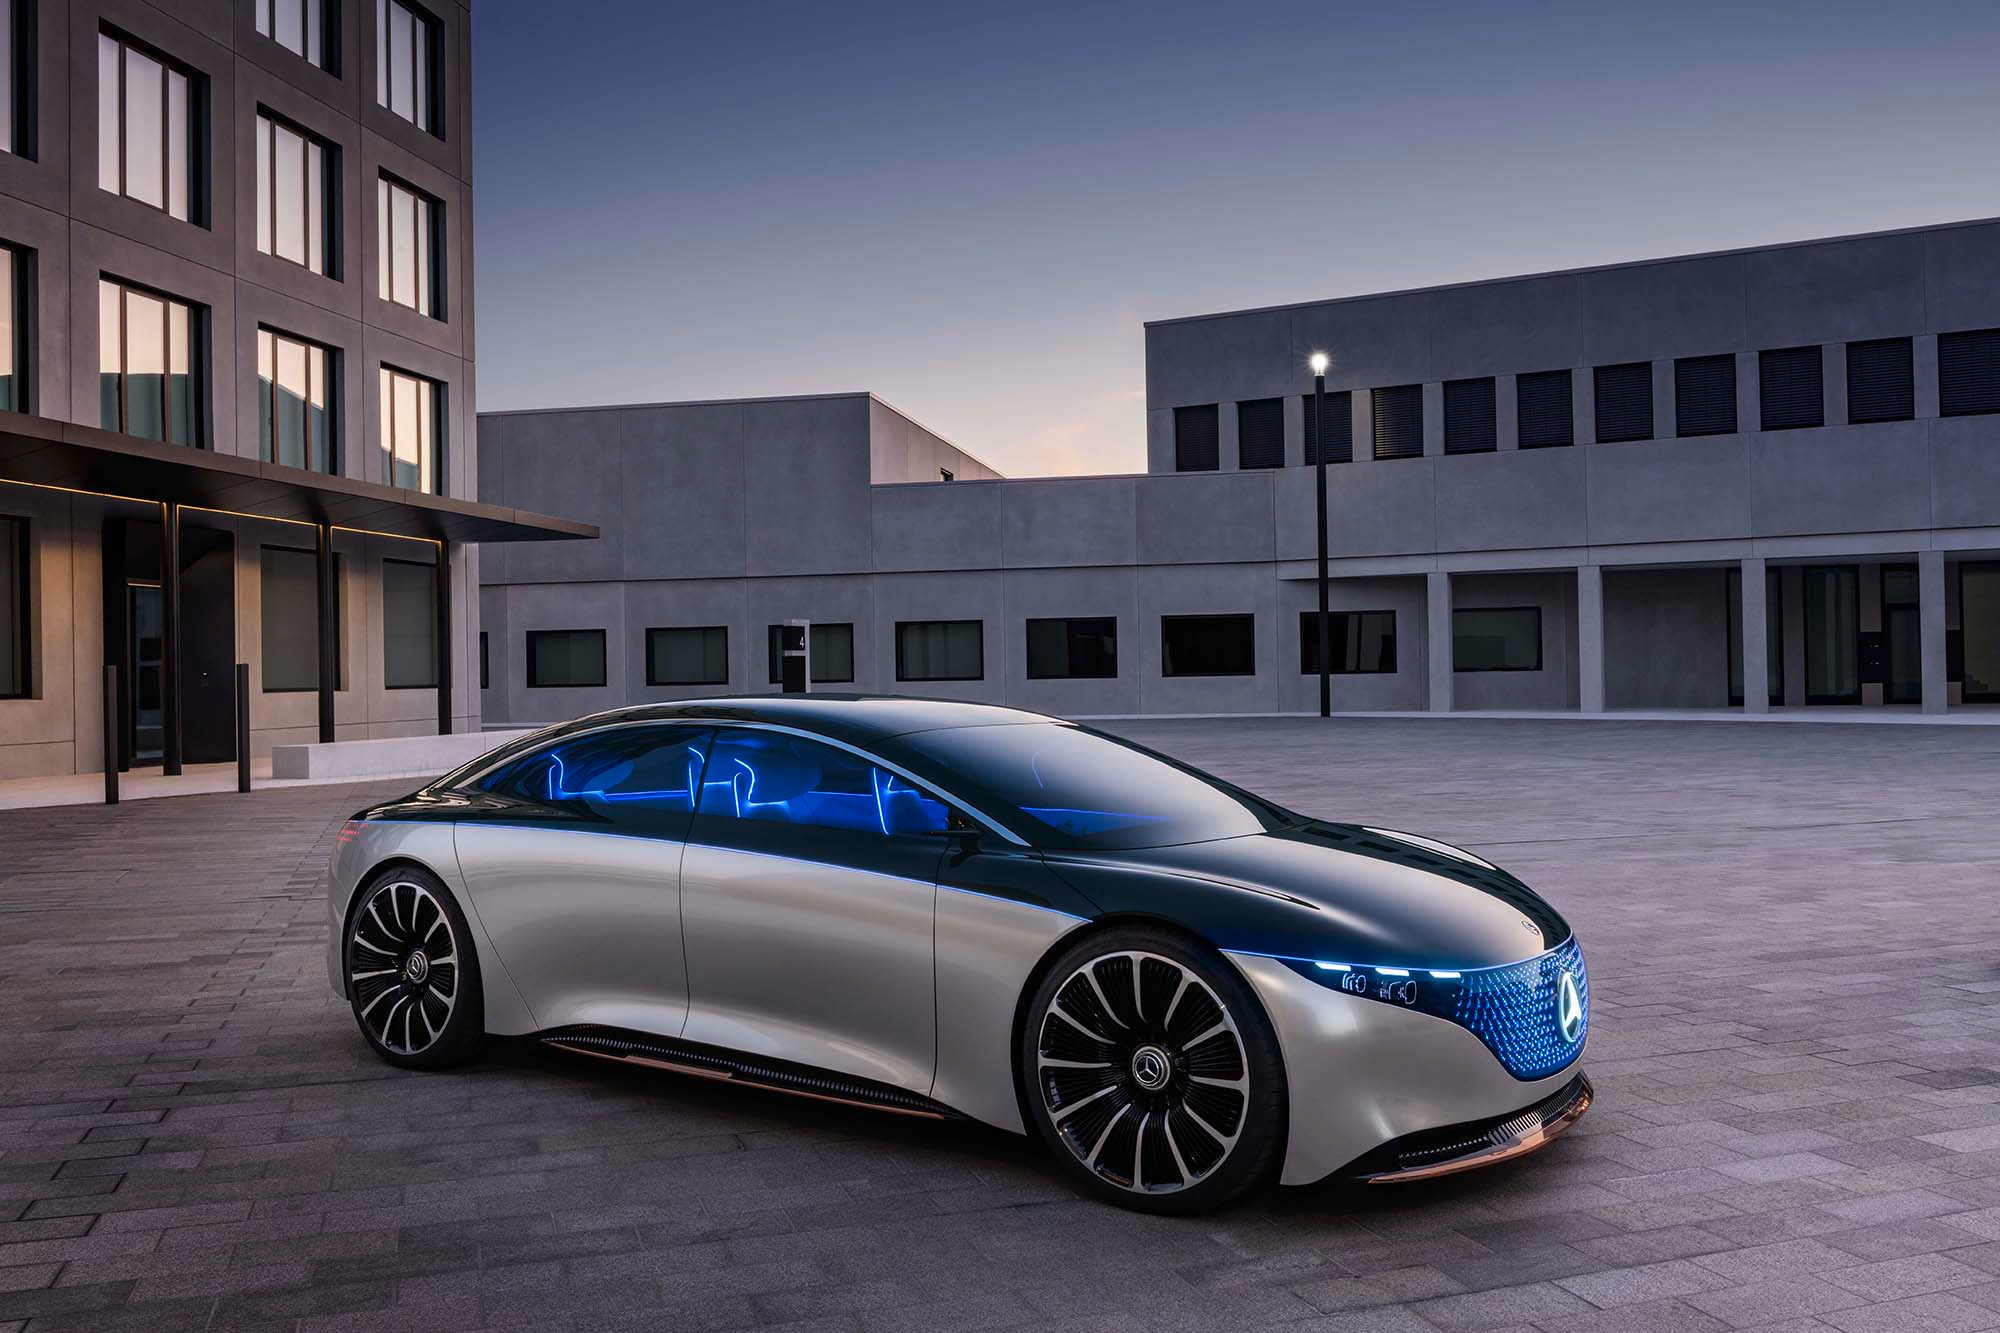 mercedes-benz-vision-eqs-2019-01-angle--black--exterior--front--silver.jpg